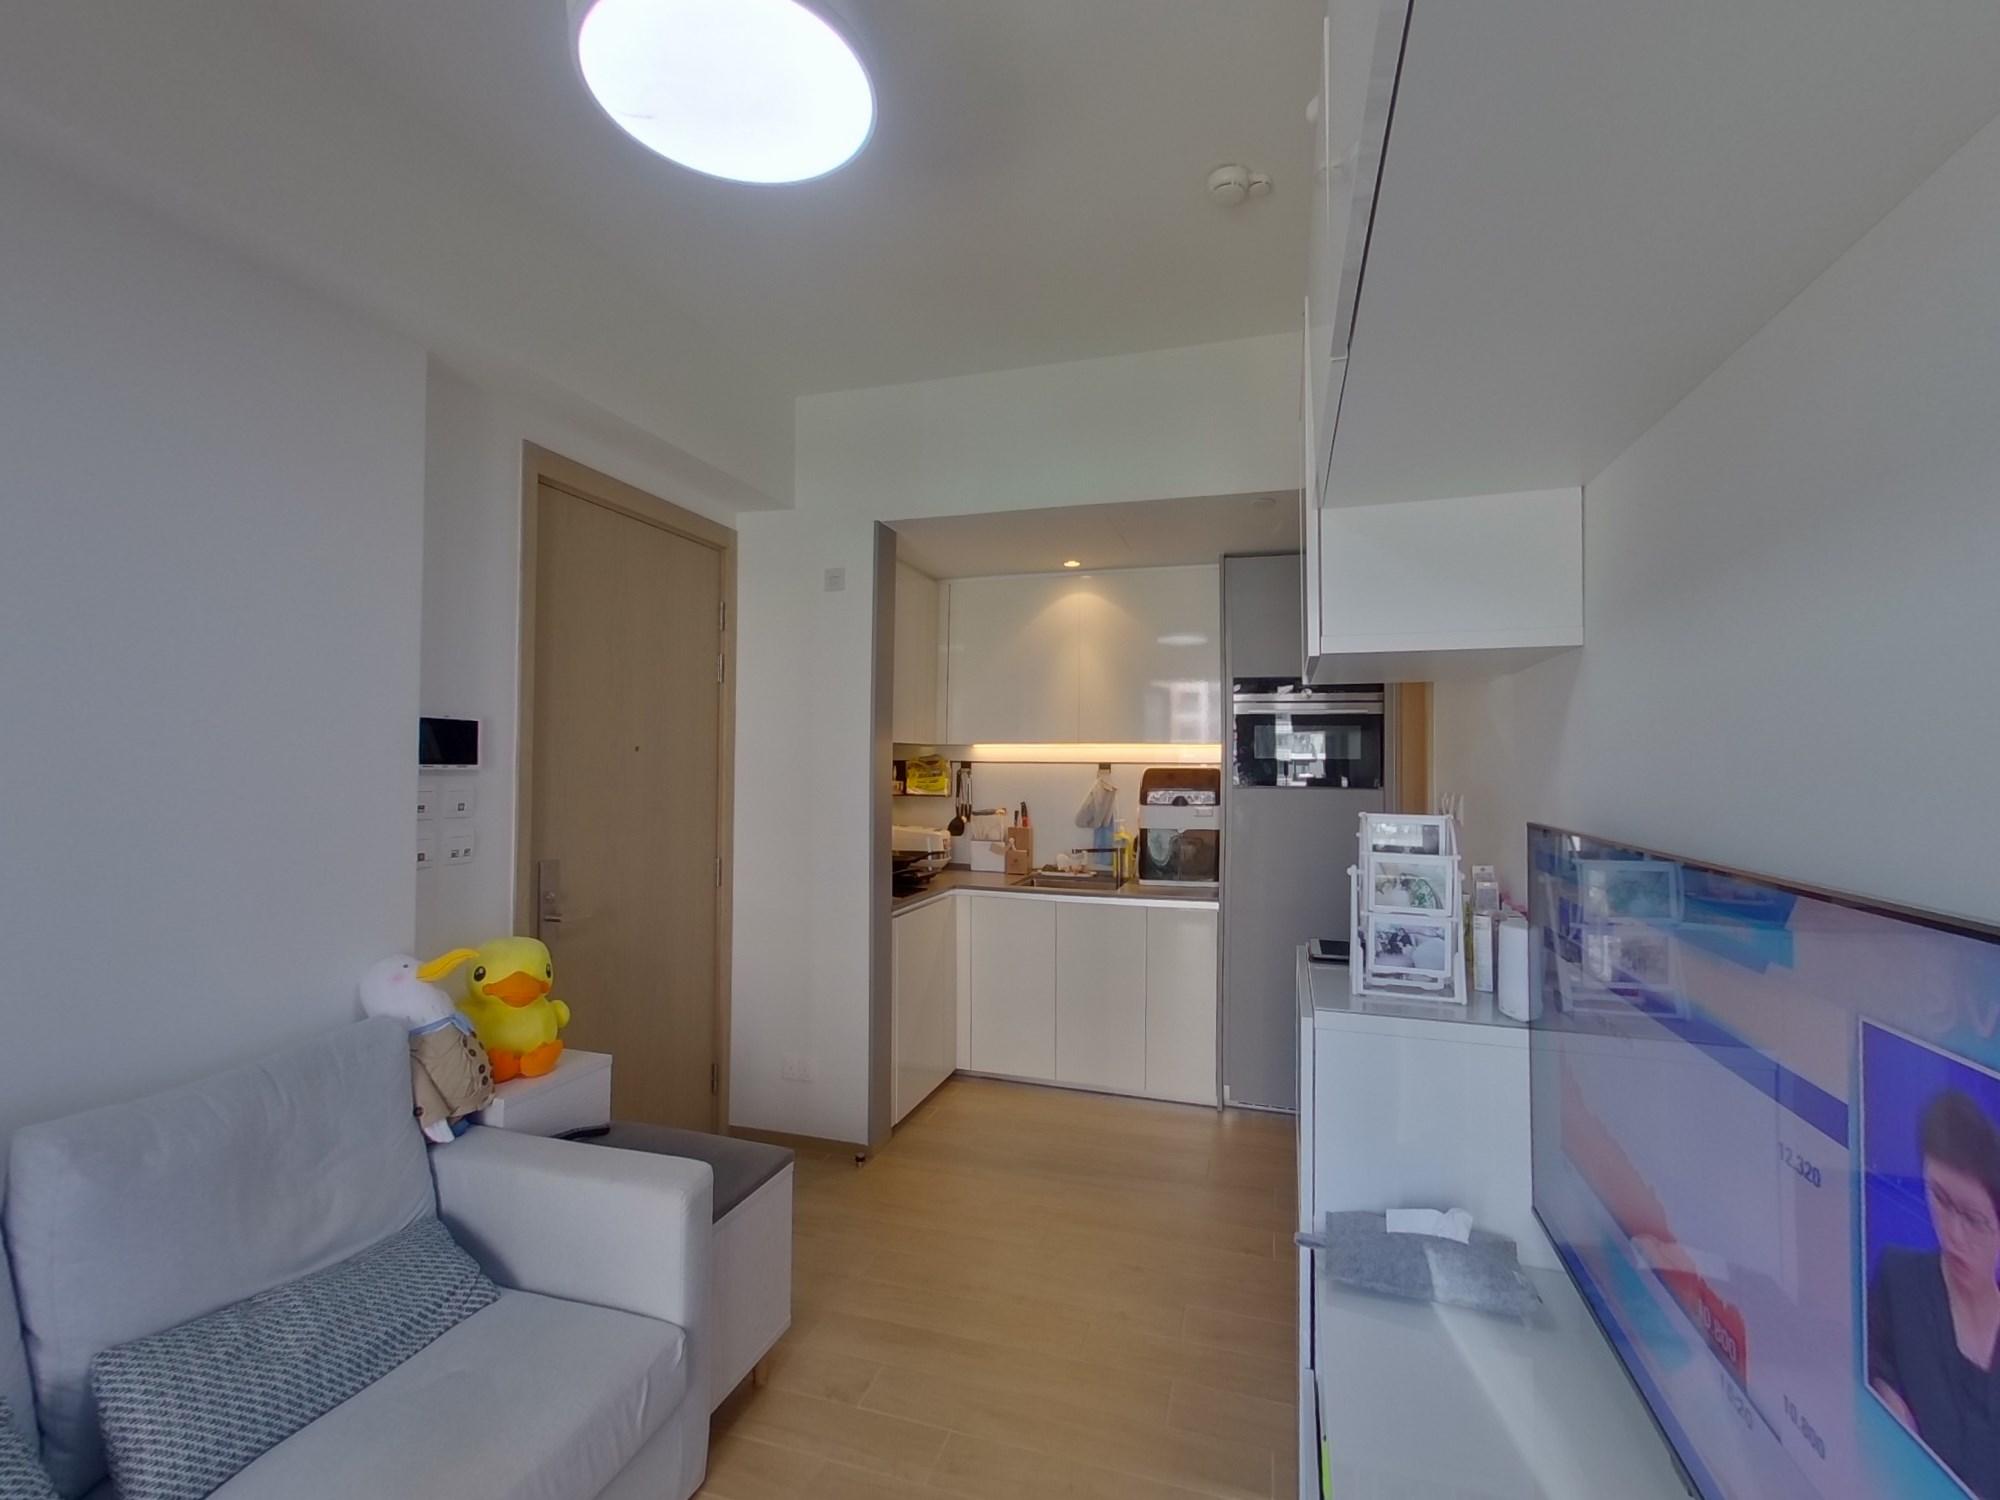 LOHAS PARK Phase 6 Lp6 - Tower 5 Low Floor Zone Flat E Tseung Kwan O